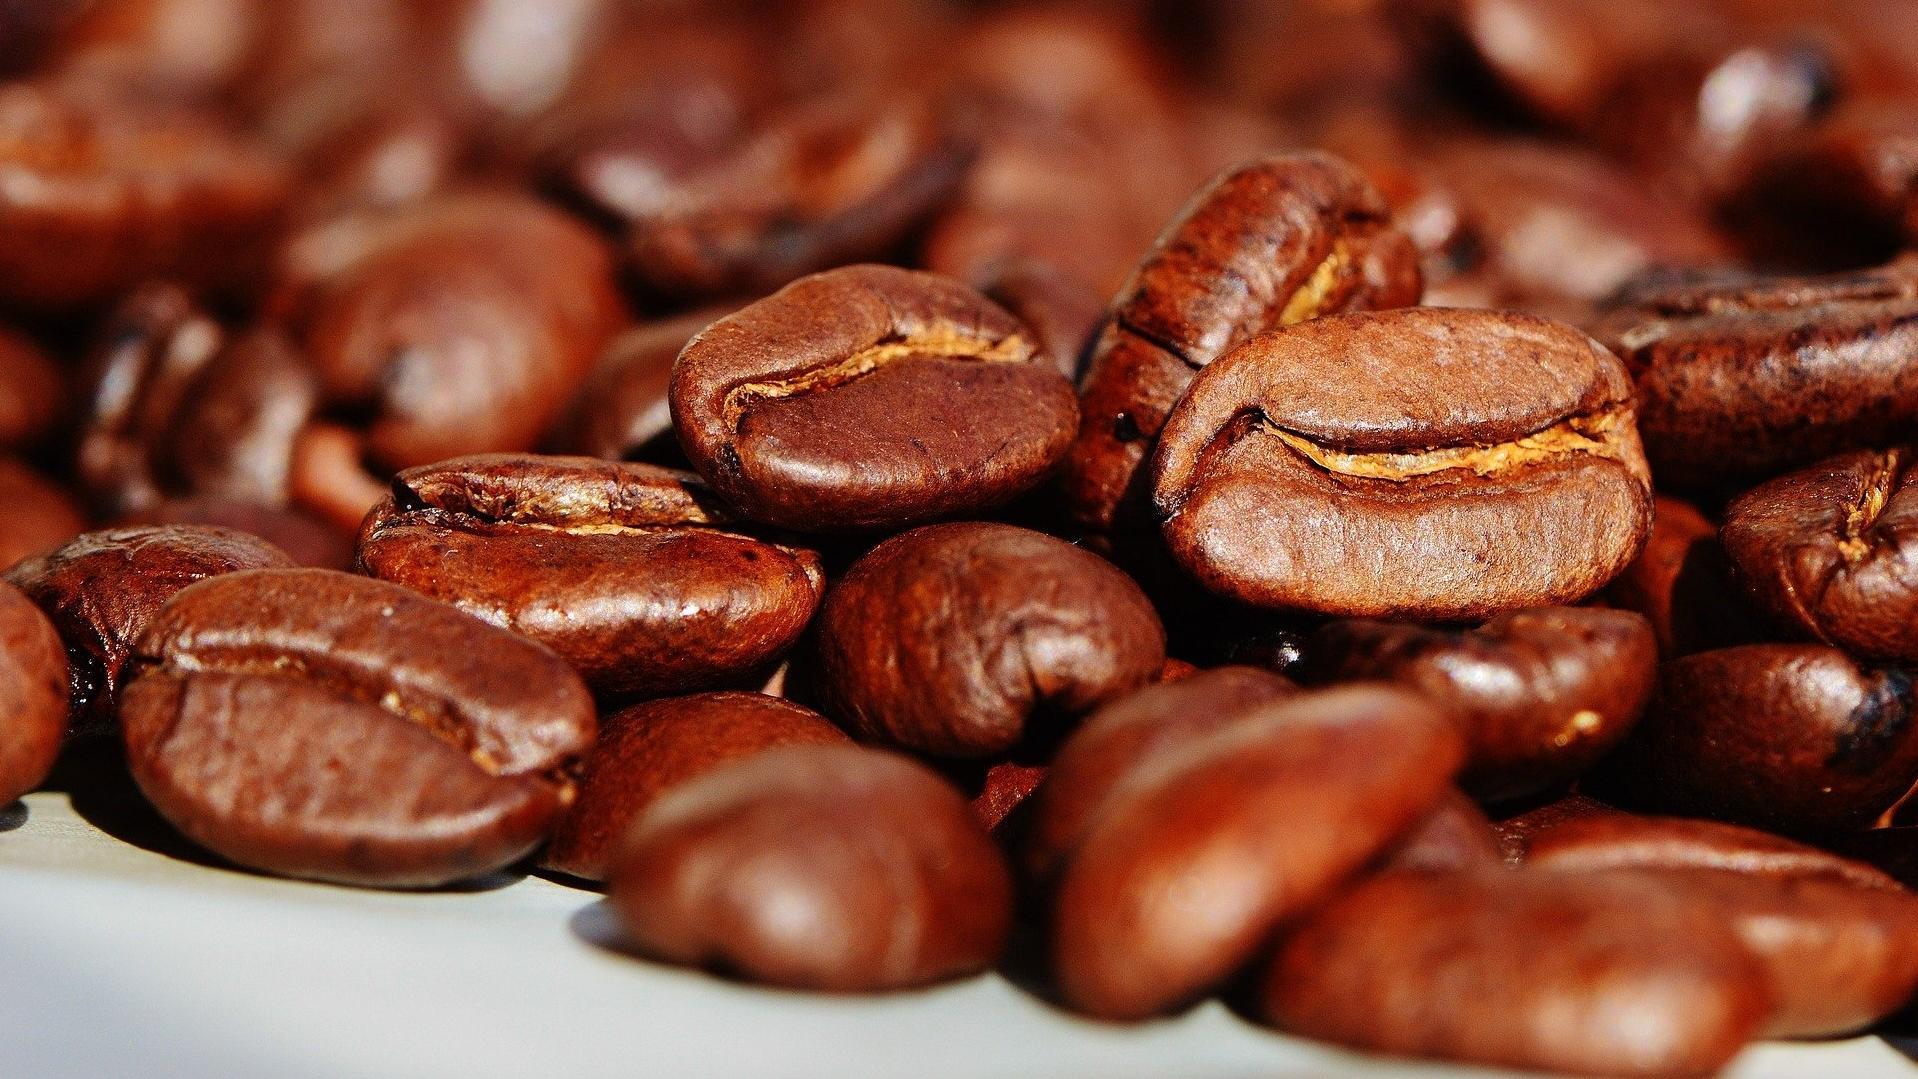 Cold Brew Kaffee selber machen - so geht's